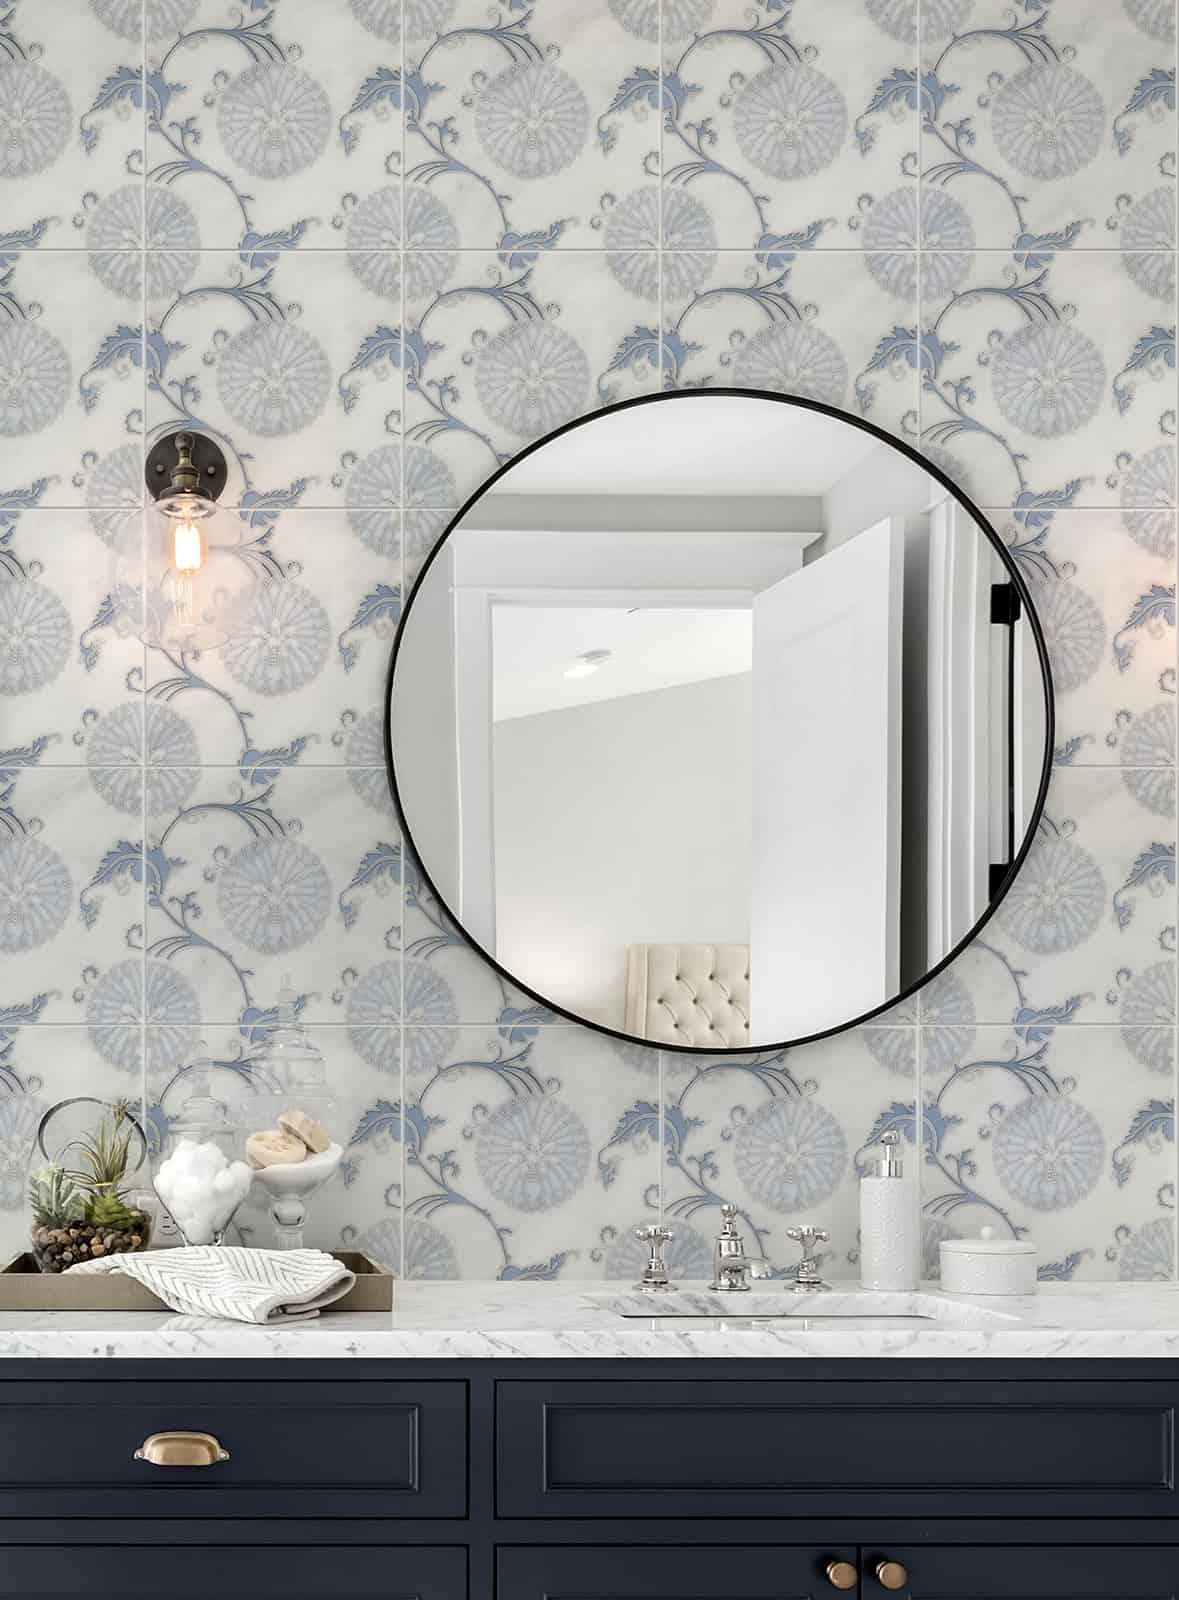 Eliana - HR - Dusty Blue - Carrara - 12x12 - Bathroom Vanity Backsplash